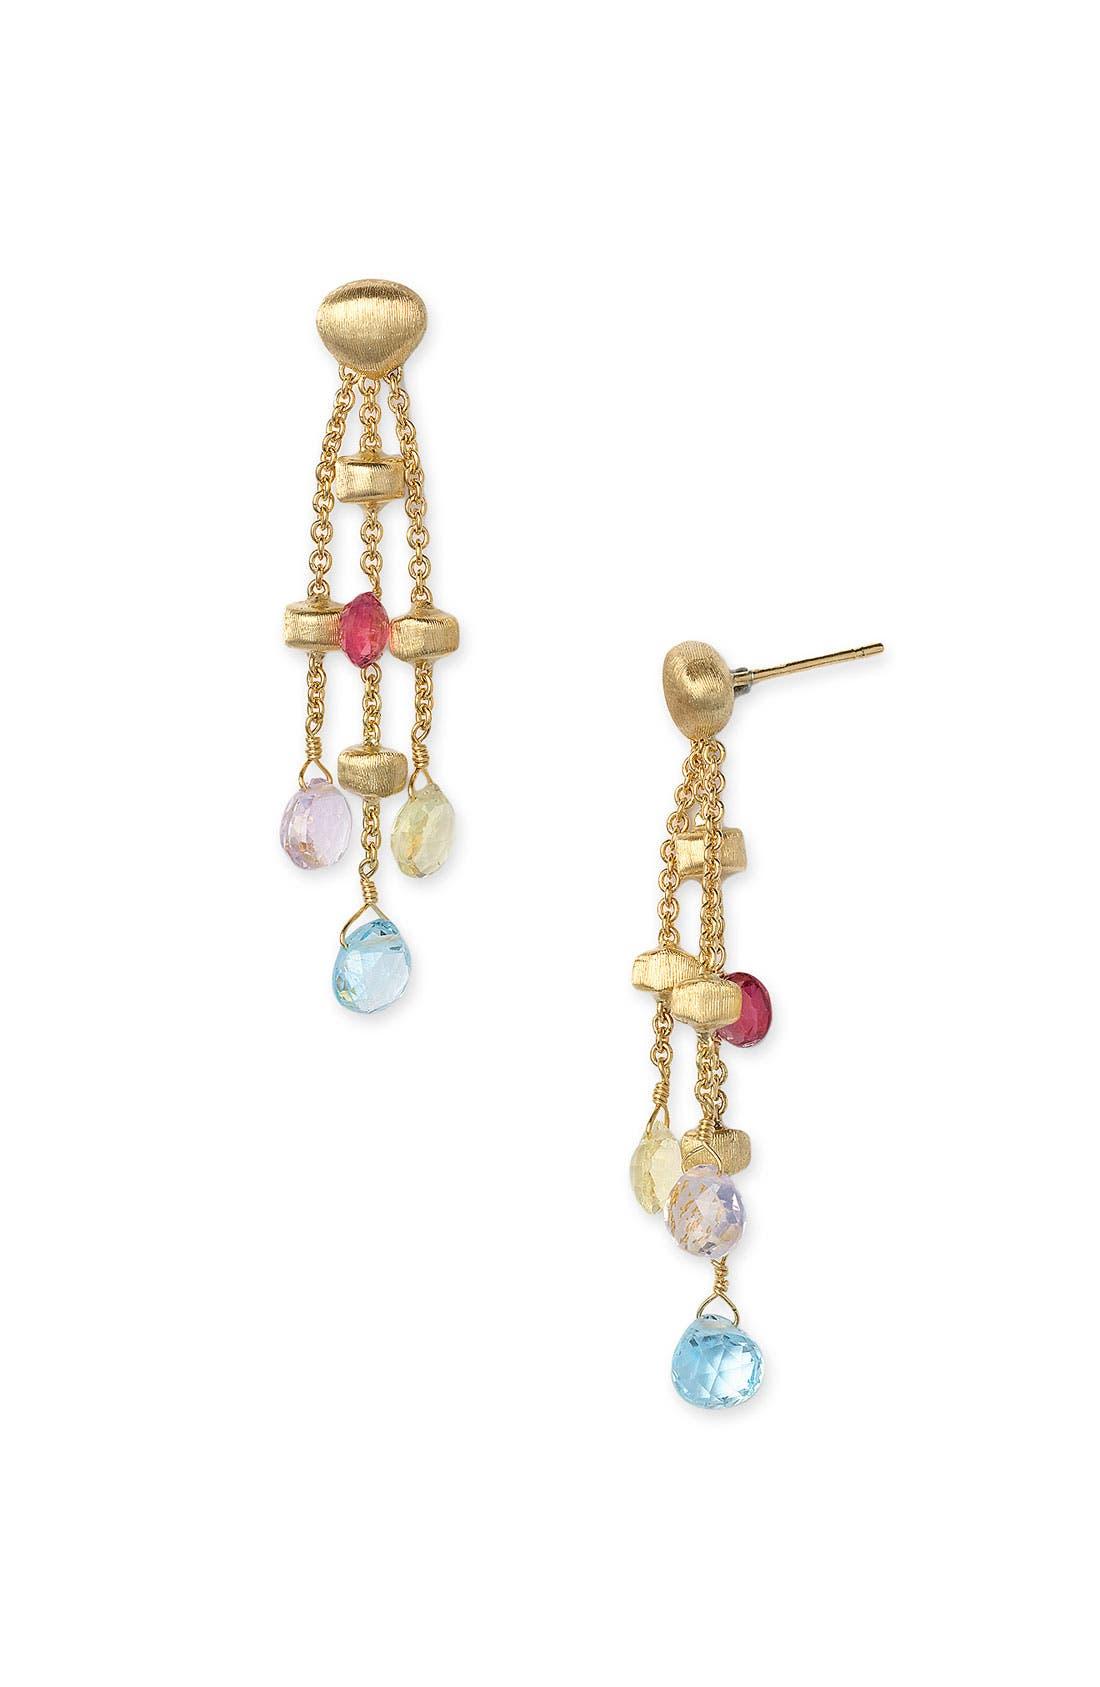 Main Image - Marco Bicego 'Paradise' Triple Strand Earrings